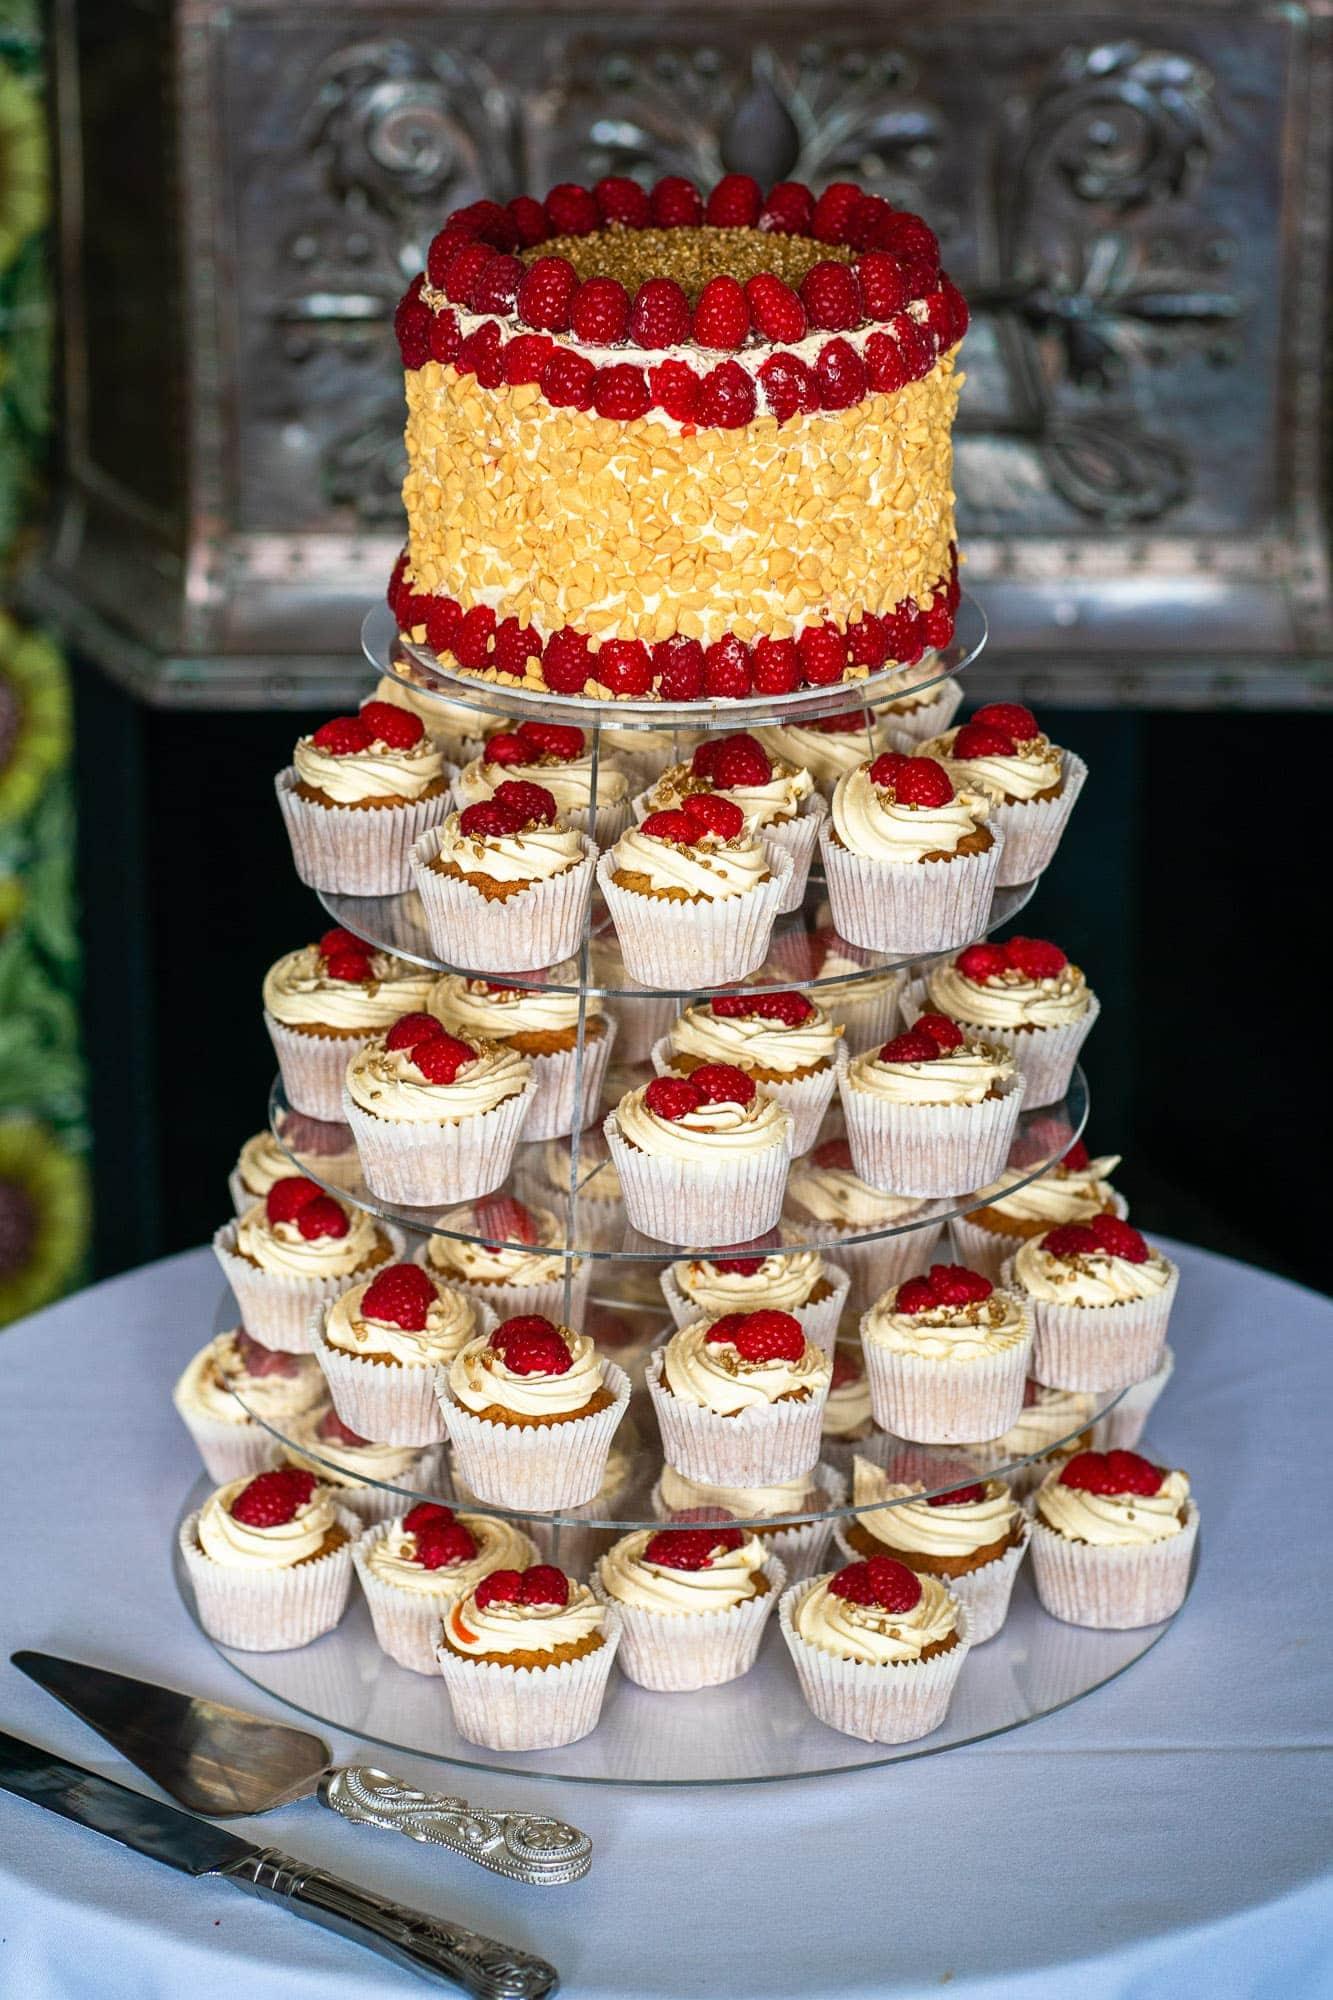 Wedding Cake, cupcakes with strawberries plus top cake